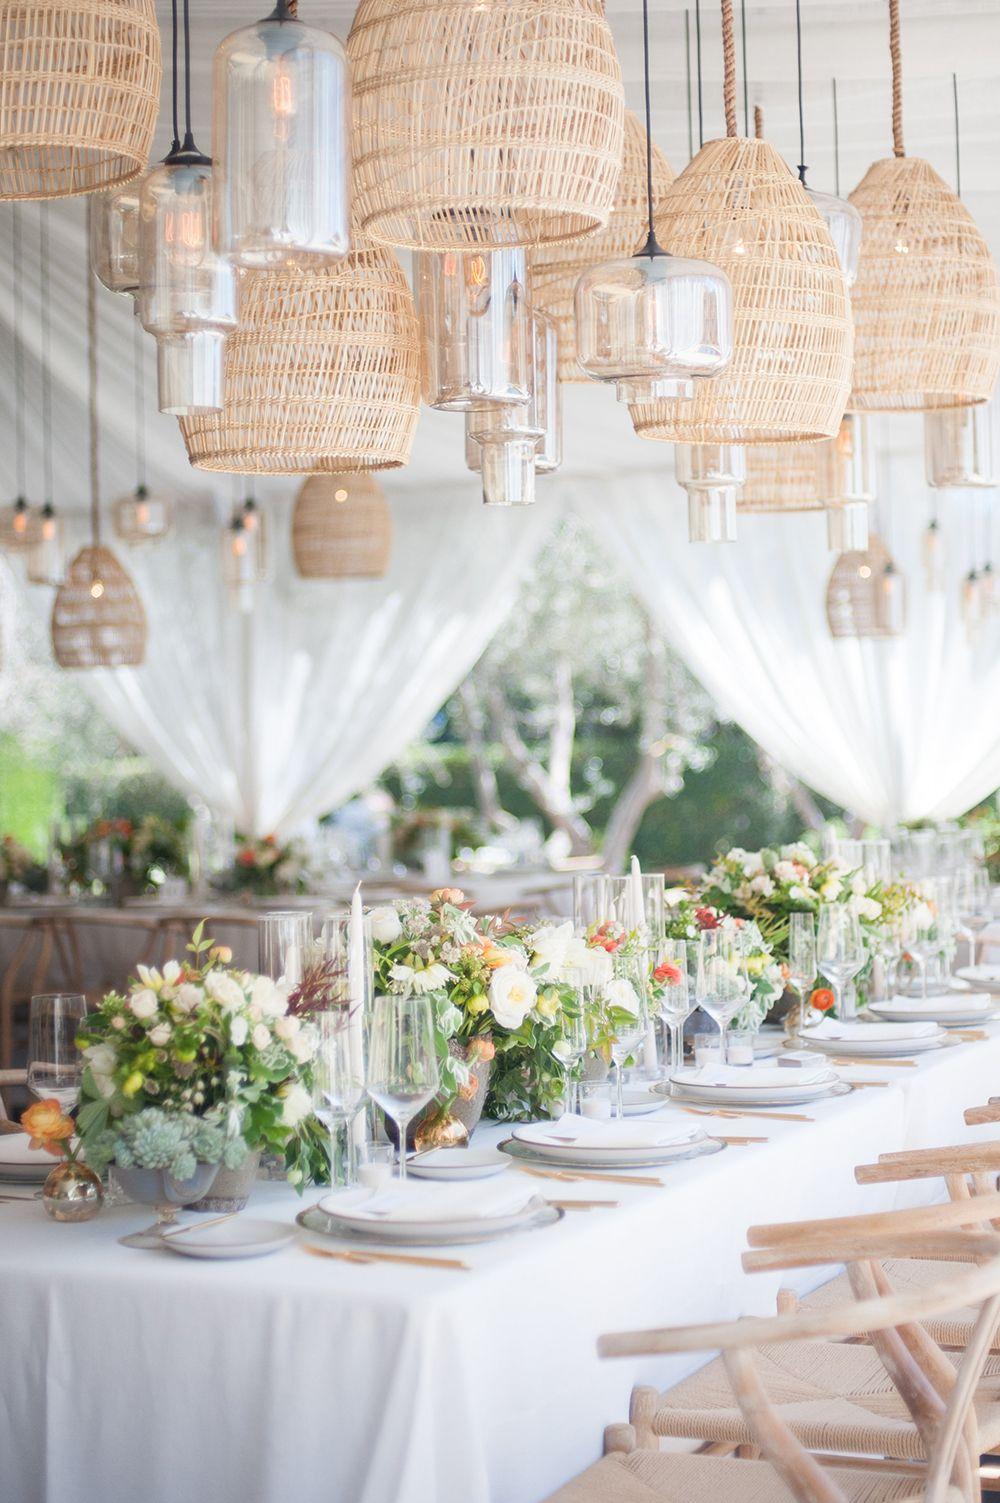 Contemporary Montecito Wedding At Home | Wedding, Linen rentals and ...